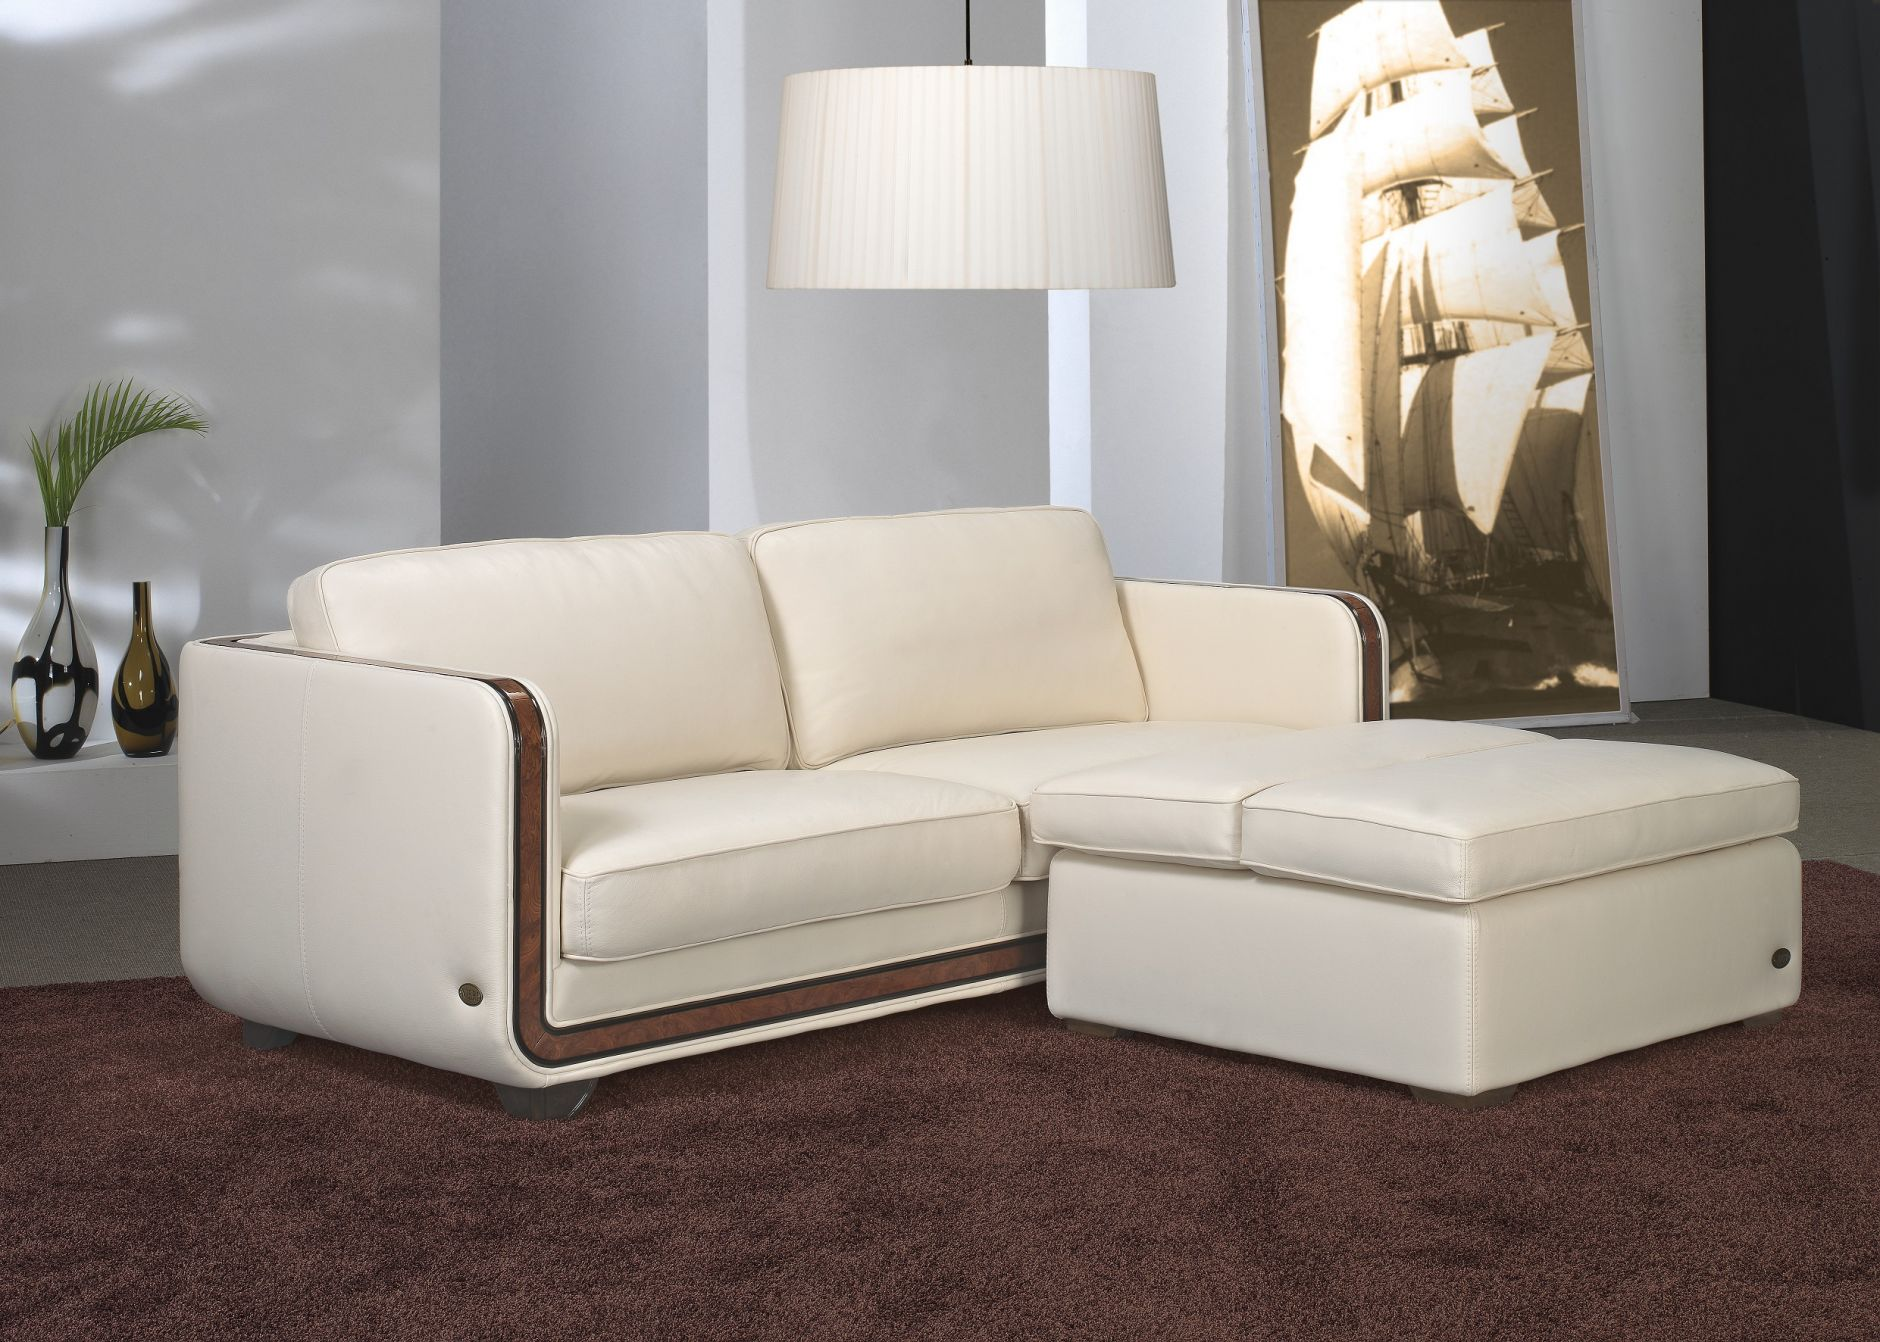 Upholstered Sofa Vip Upholstered Furniture Nieri Divani